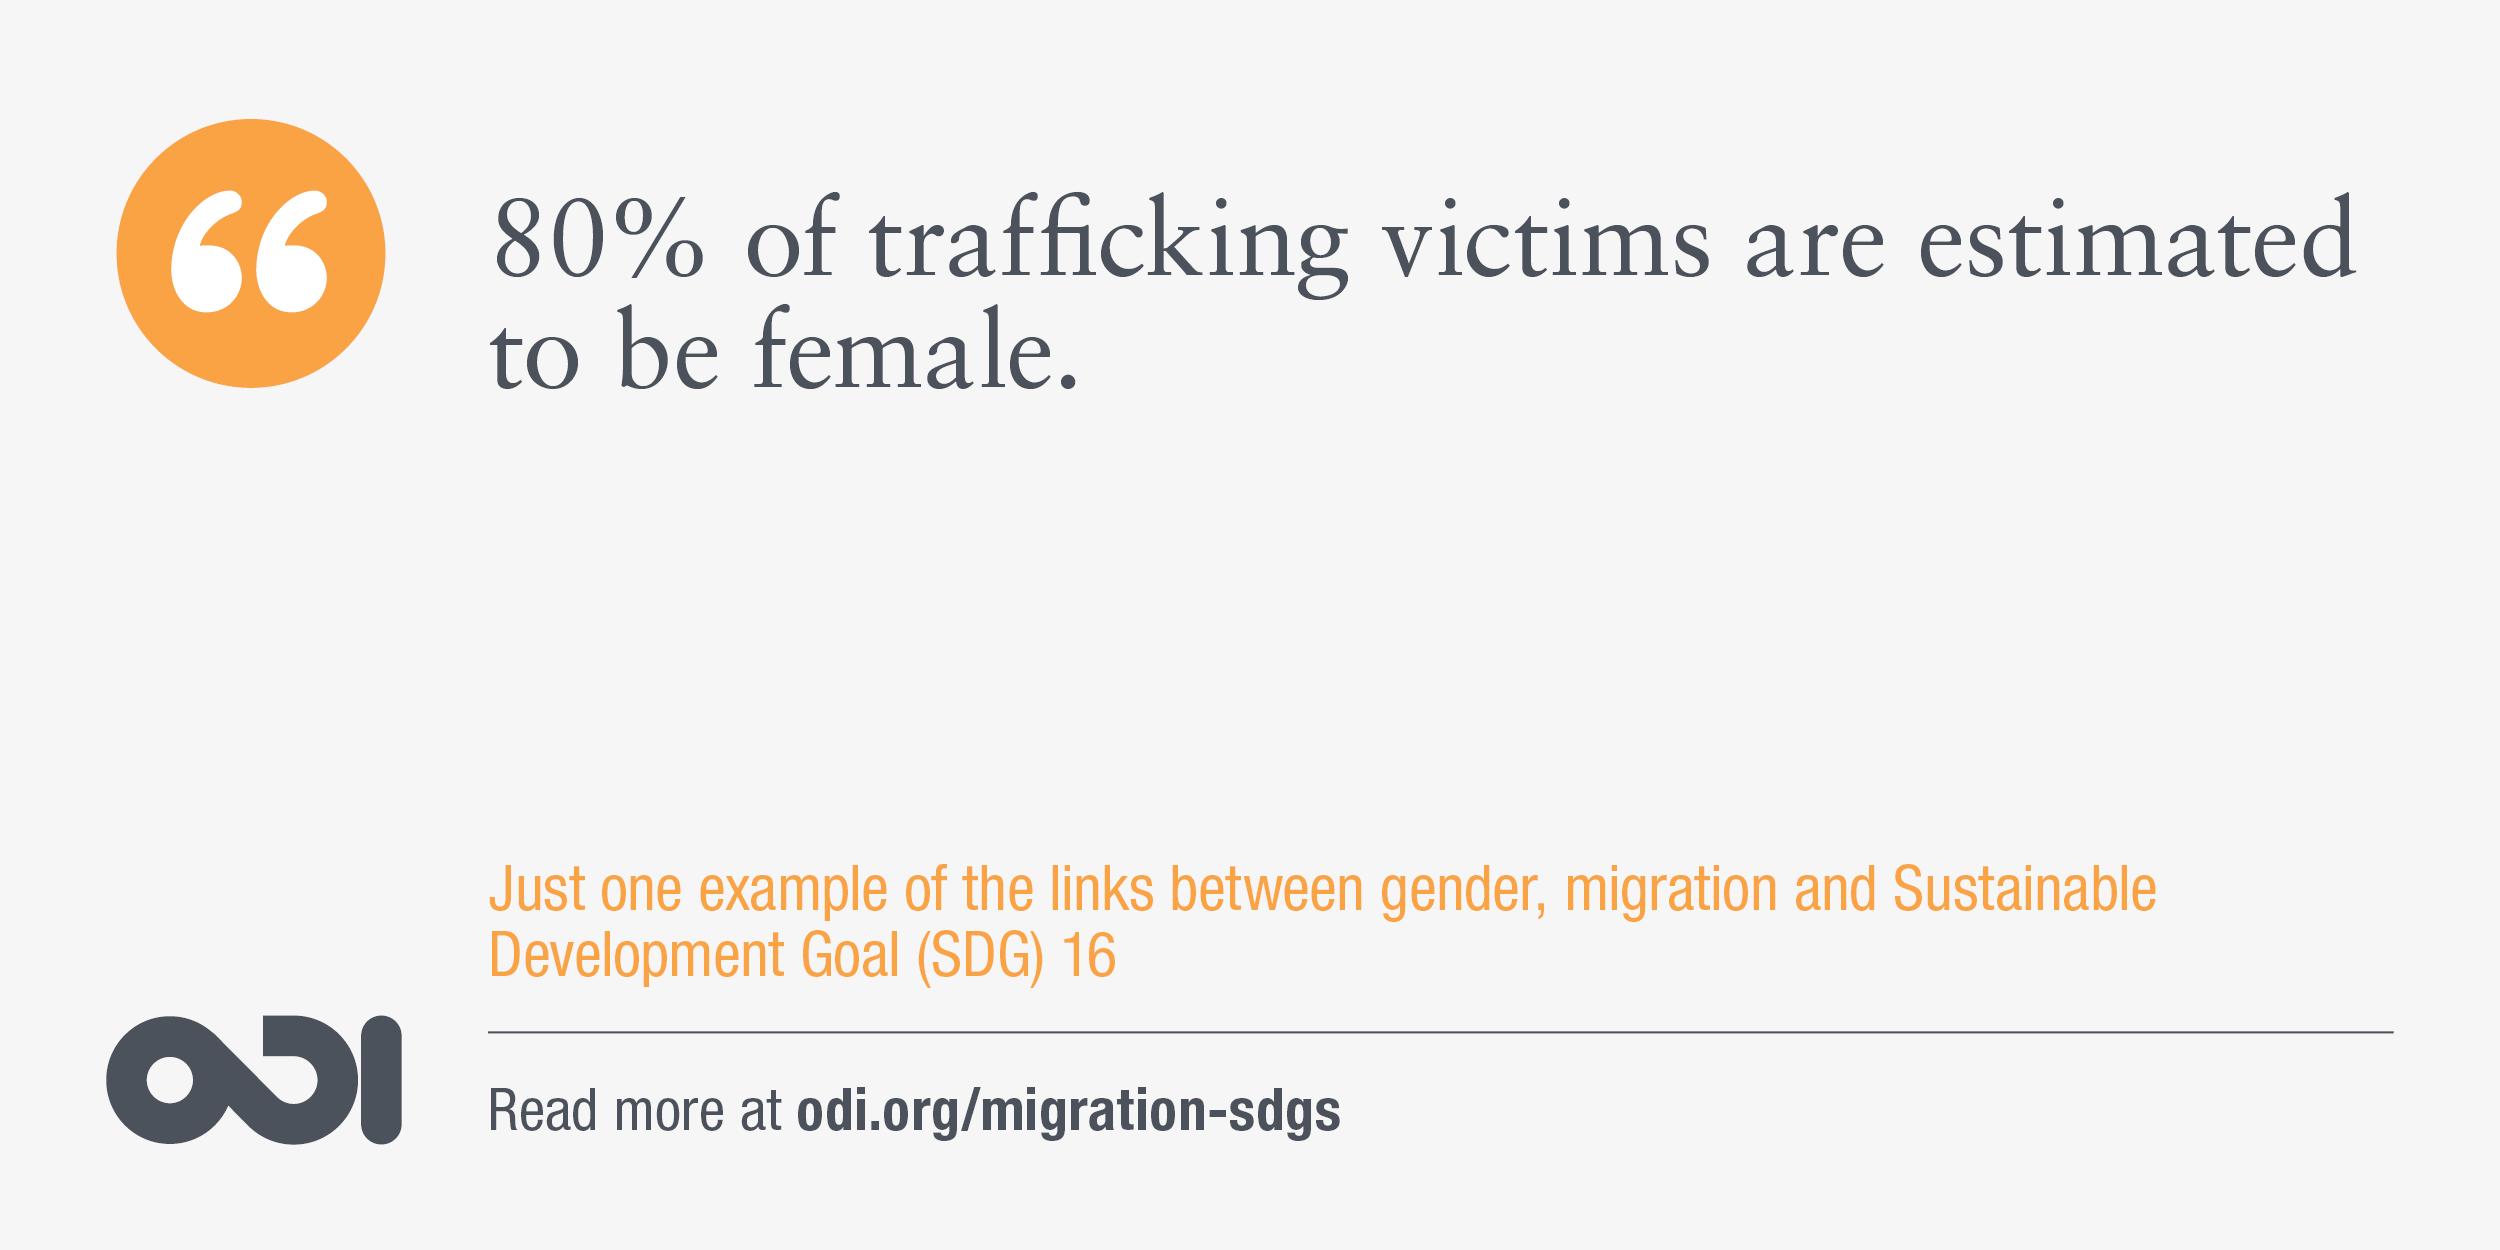 The links between gender, migration and SDG 16.